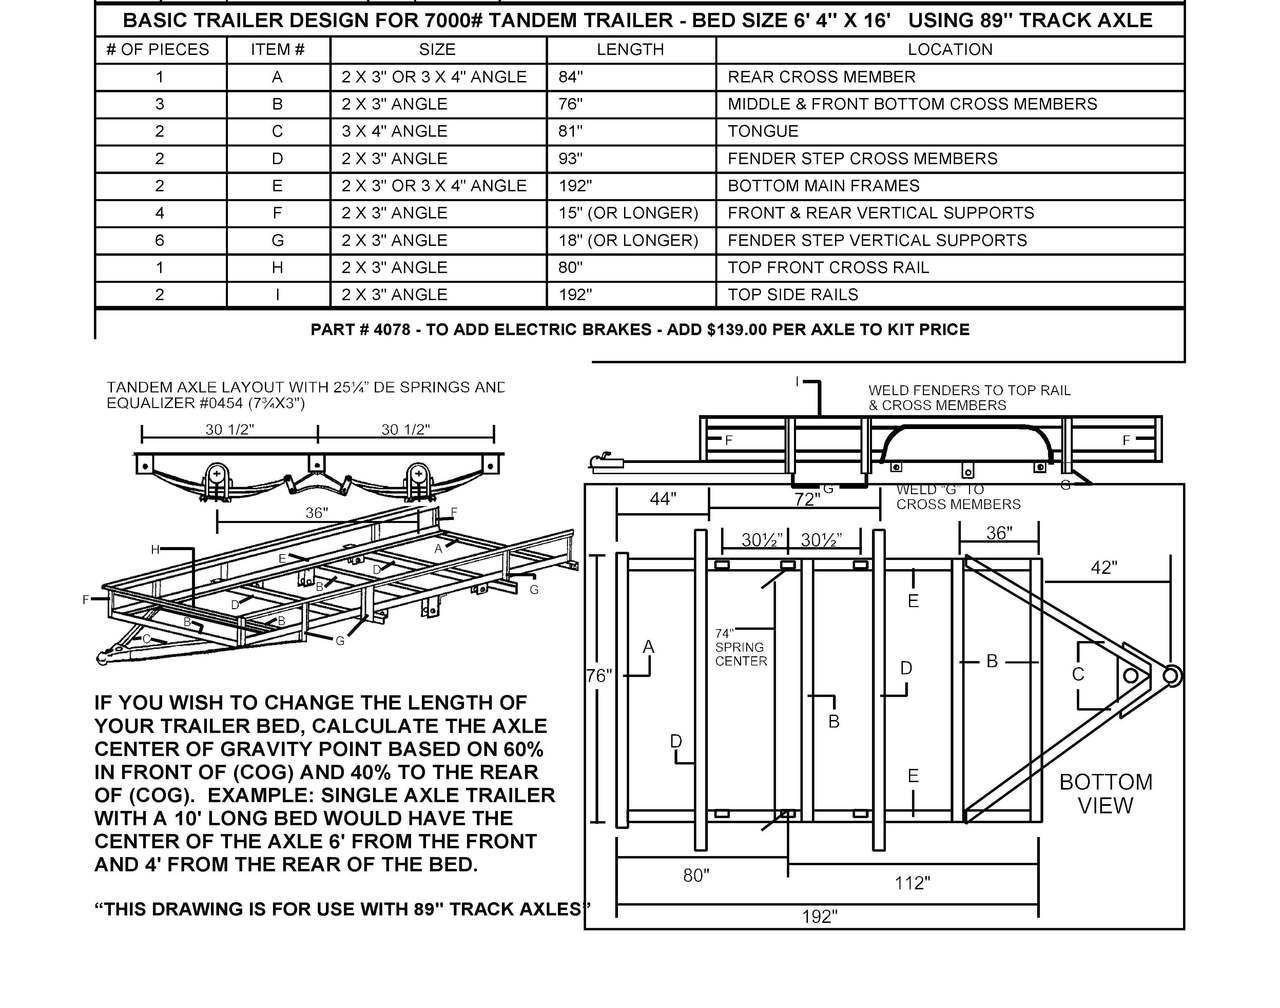 "95"" Tandem Trailer Parts Kit 7,000lbs GVWR Trailer axles"